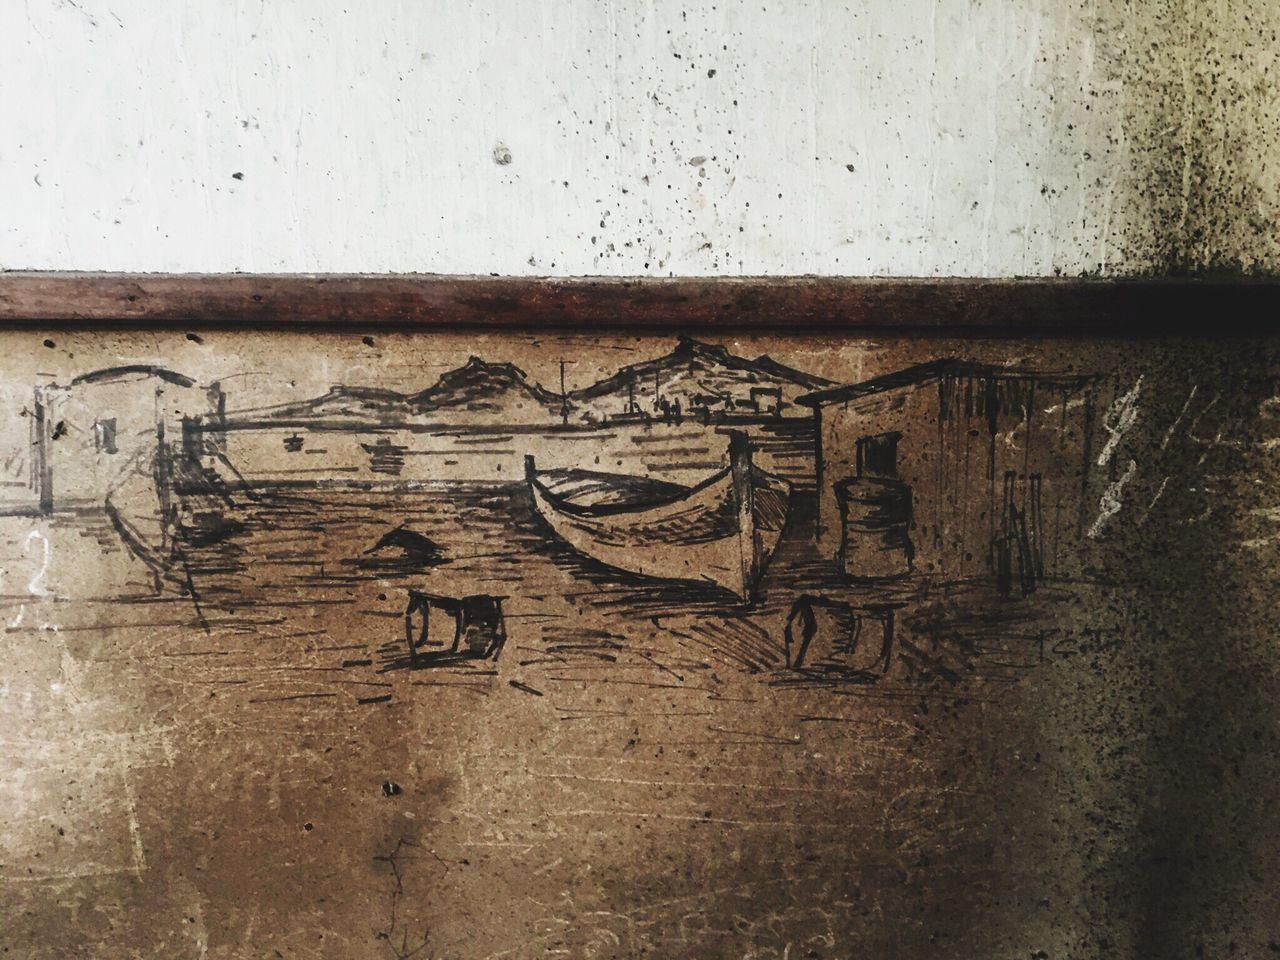 Good Morning Sketch Charcoal Drawing Wood Gulf Coast Naples Italy Resilienza David De La Cruz